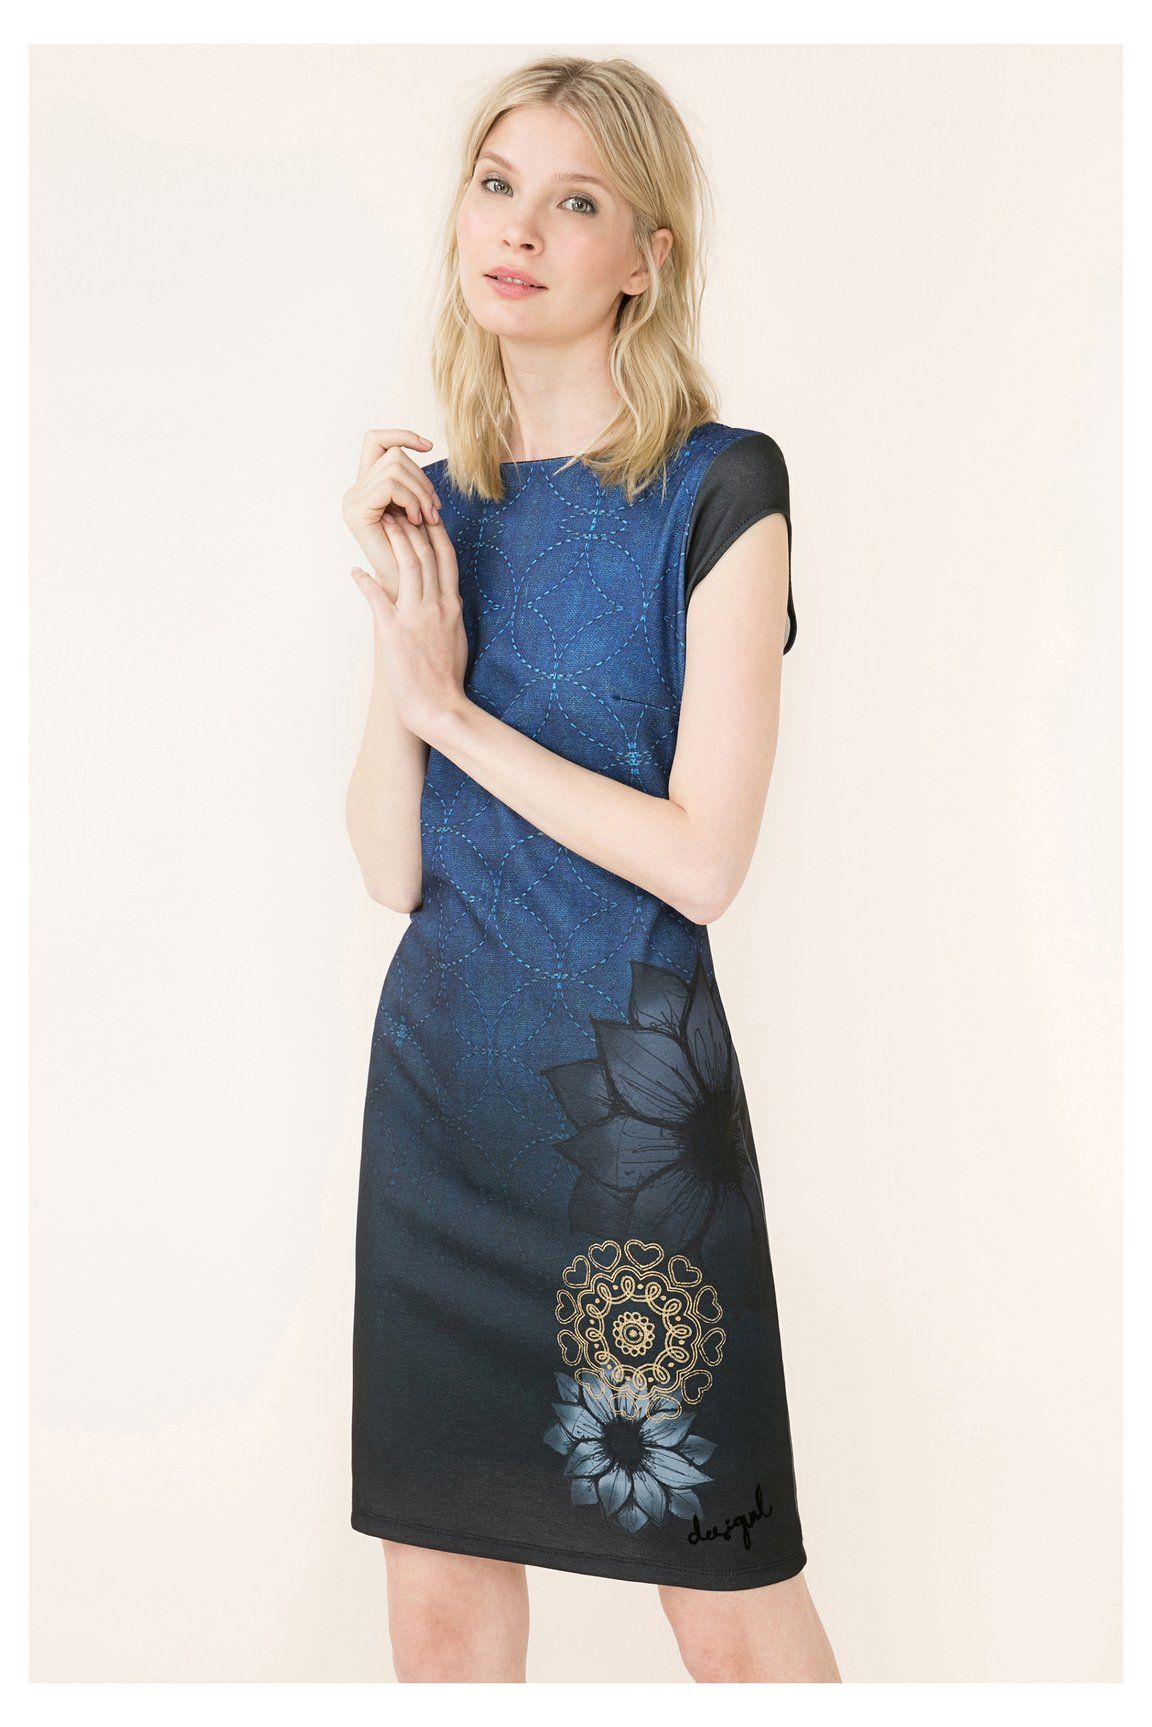 Desigual Estelar - 67V28C3 | Desigual dress AW16 | Pinterest